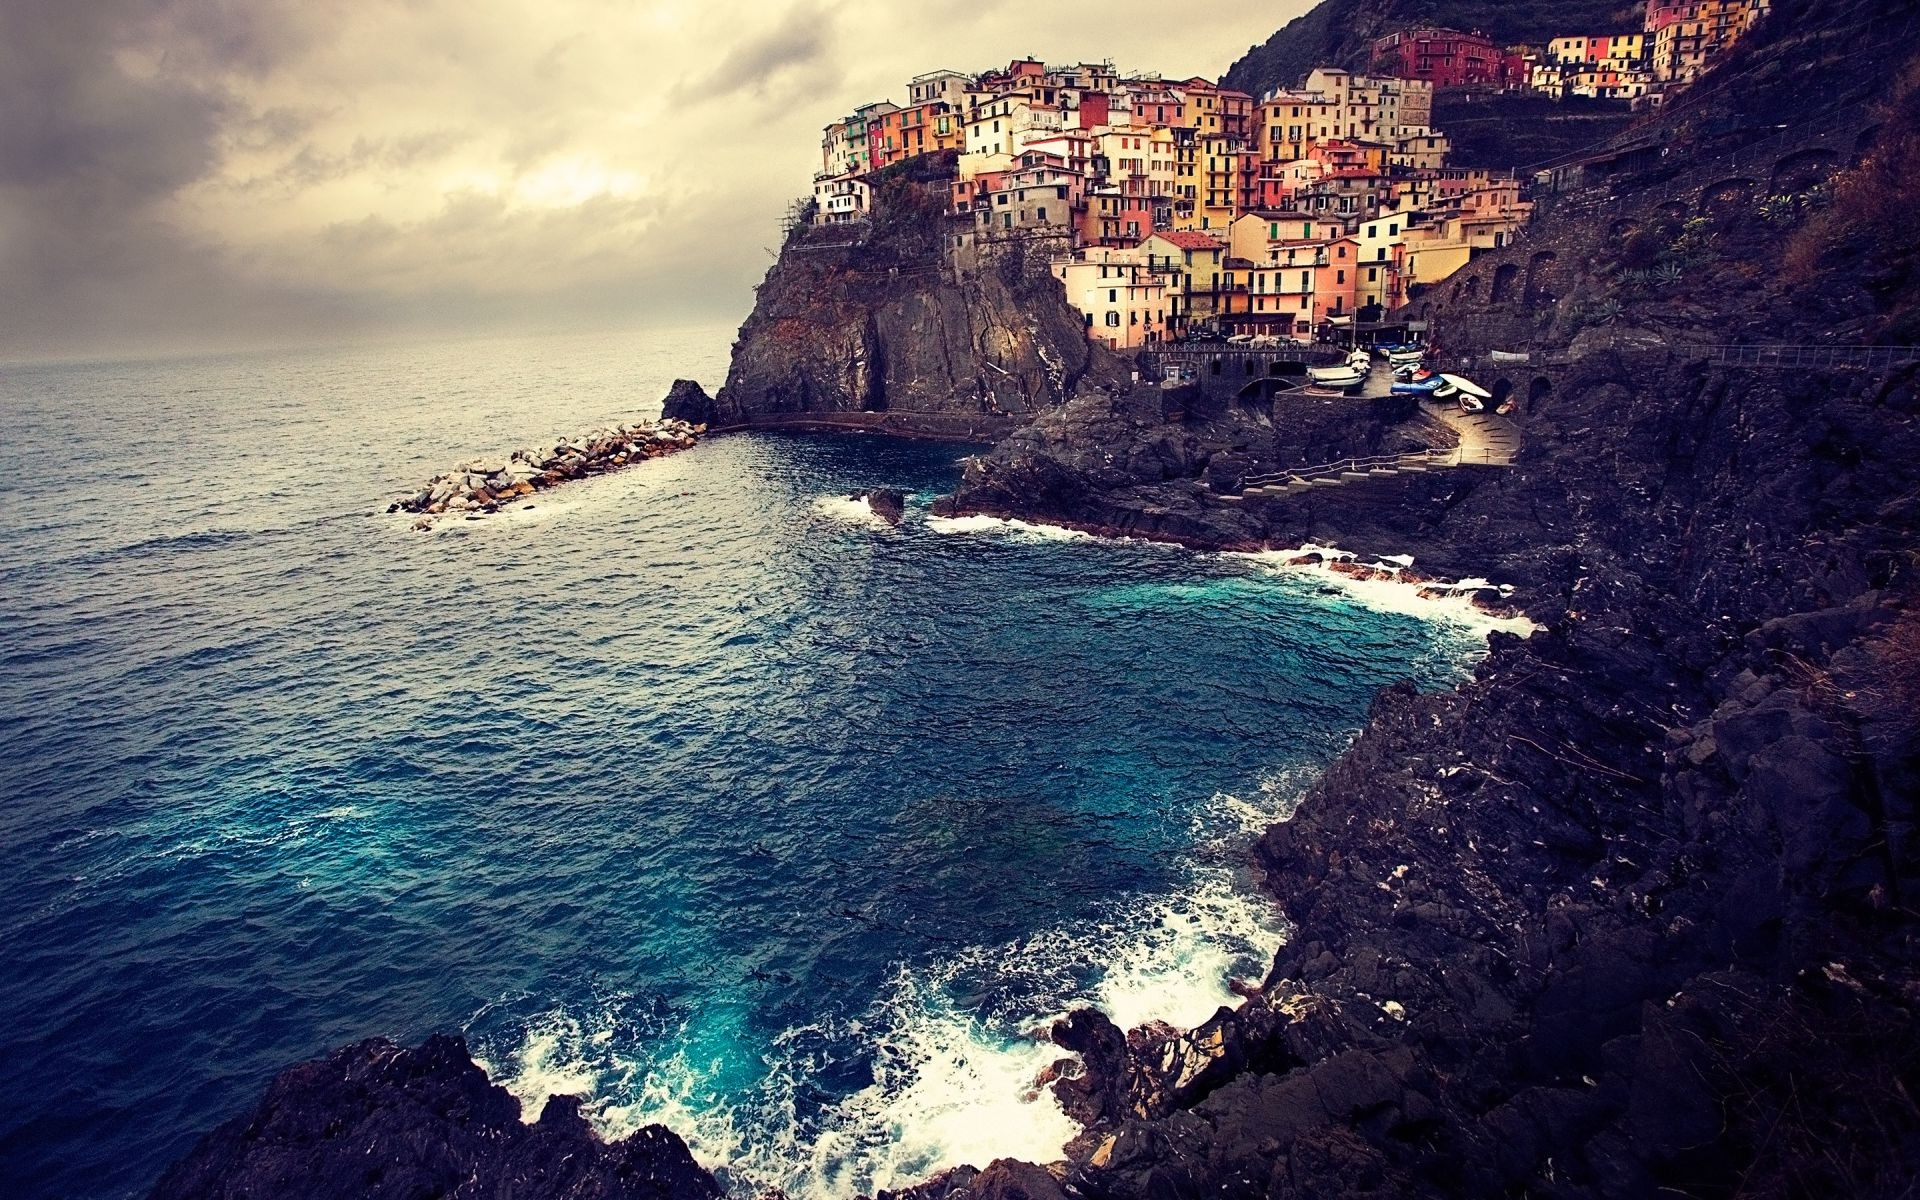 Обои дома, скалы, Пейзаж, Manarola, italy, побережье. Города foto 8